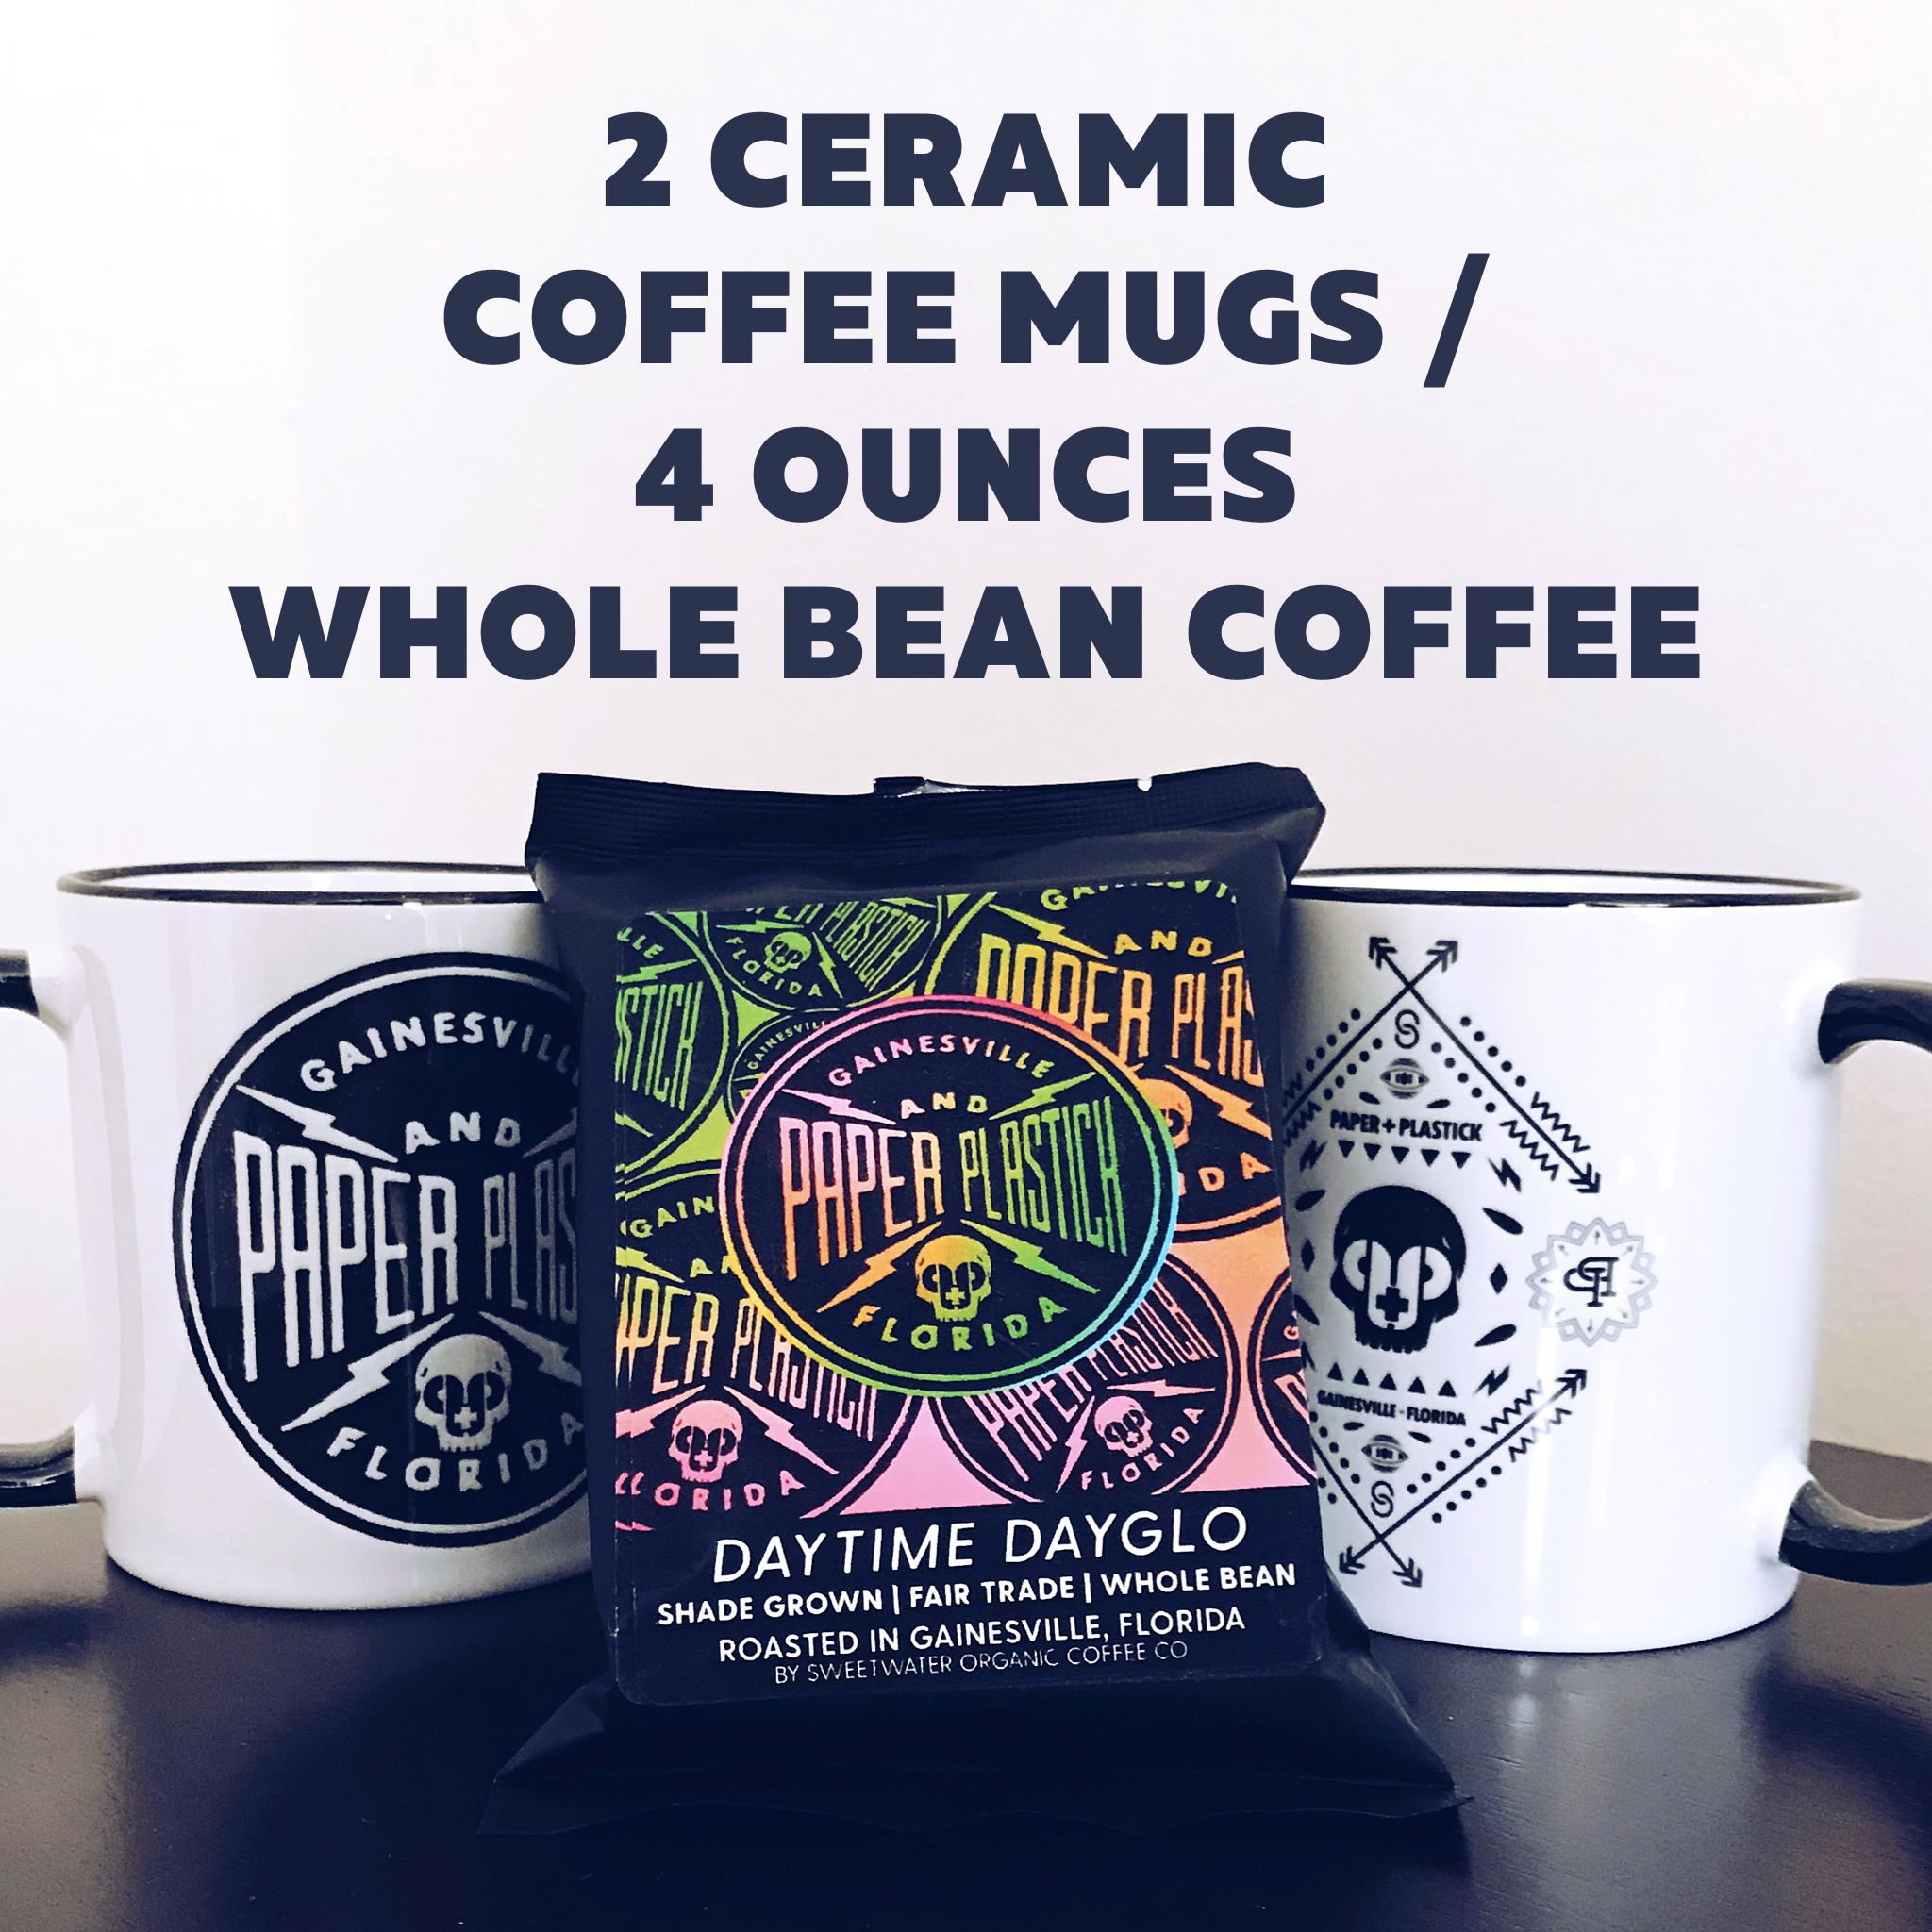 2 Ceramic Coffee Mugs + 4 Ounce Whole Bean Coffee